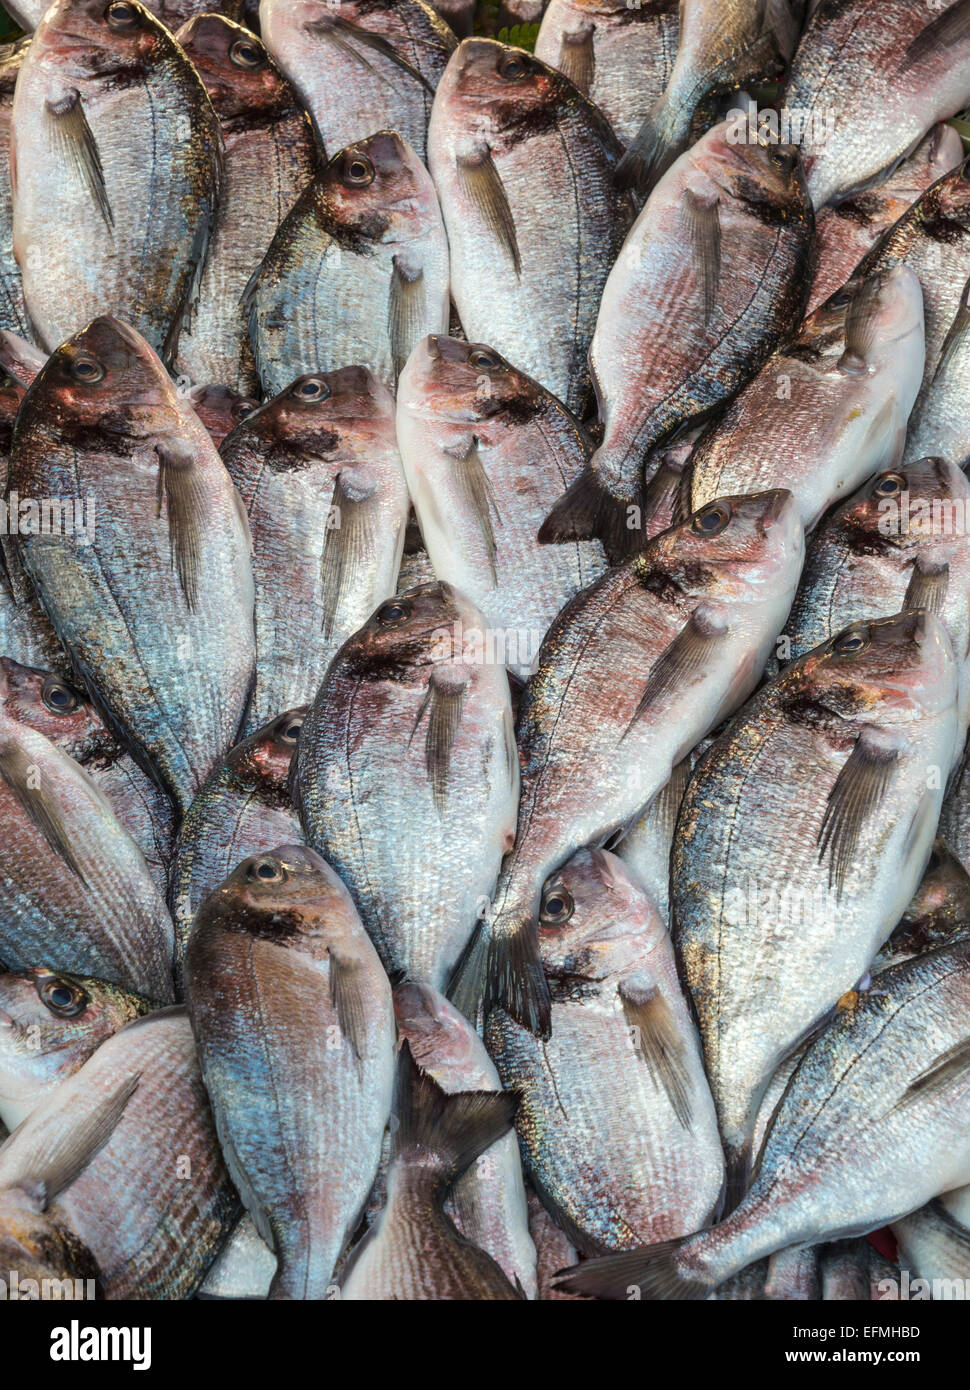 Mediterranean Sea Bream at the fish market on Karakoy waterfront, Beyoglu,  Istanbul, Turkey. Stock Photo